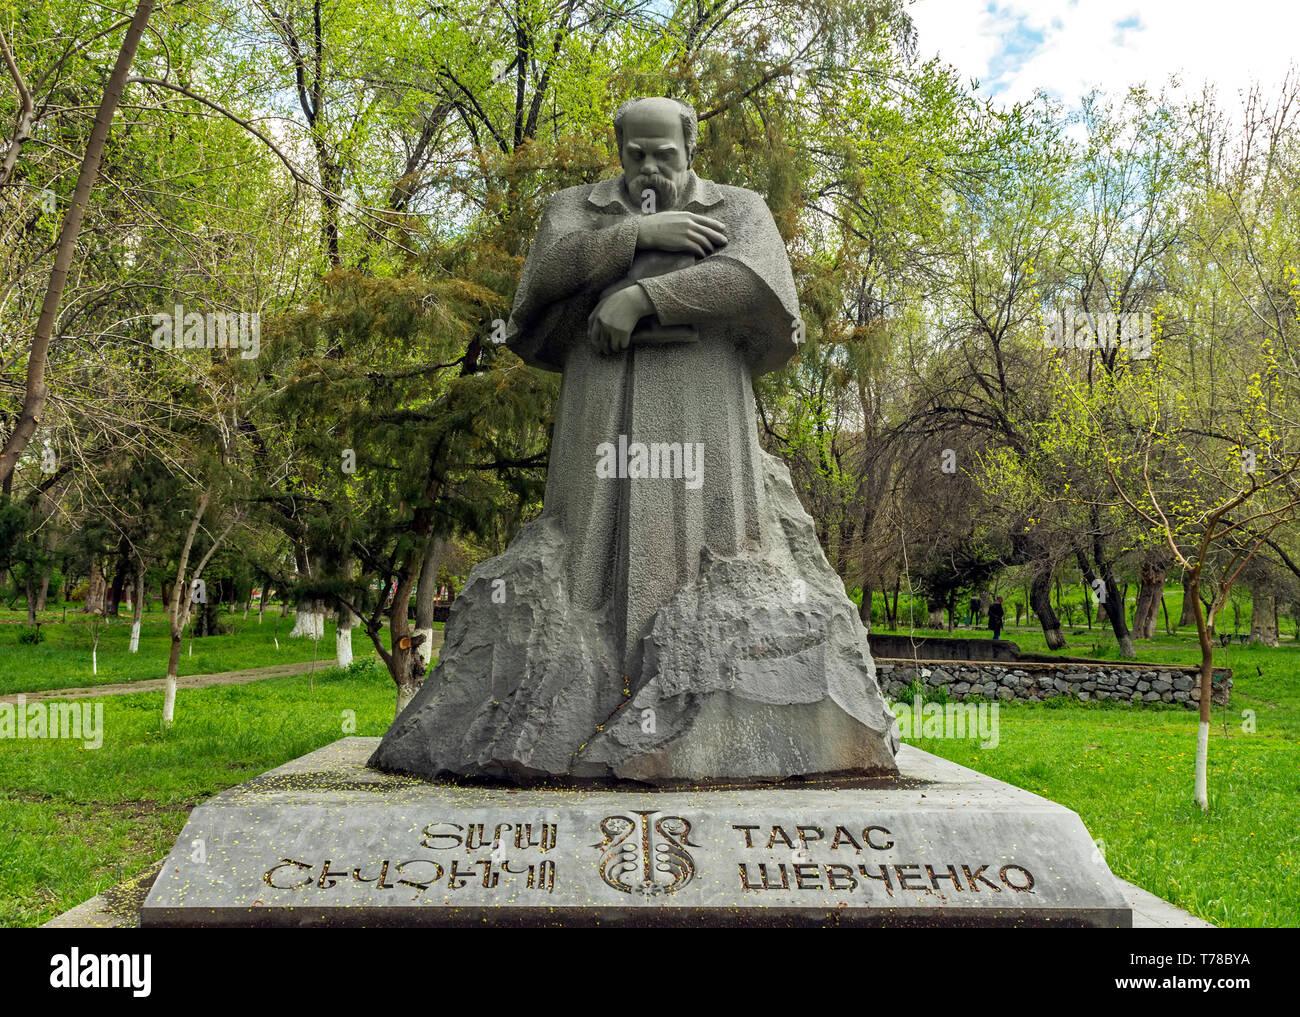 YEREVAN,ARMENIA - APRIL 18,2019: The statue of Taras Shevchenko - ukrainian poet and writer. Also known as an artist, novelist, ethnographer. - Stock Image